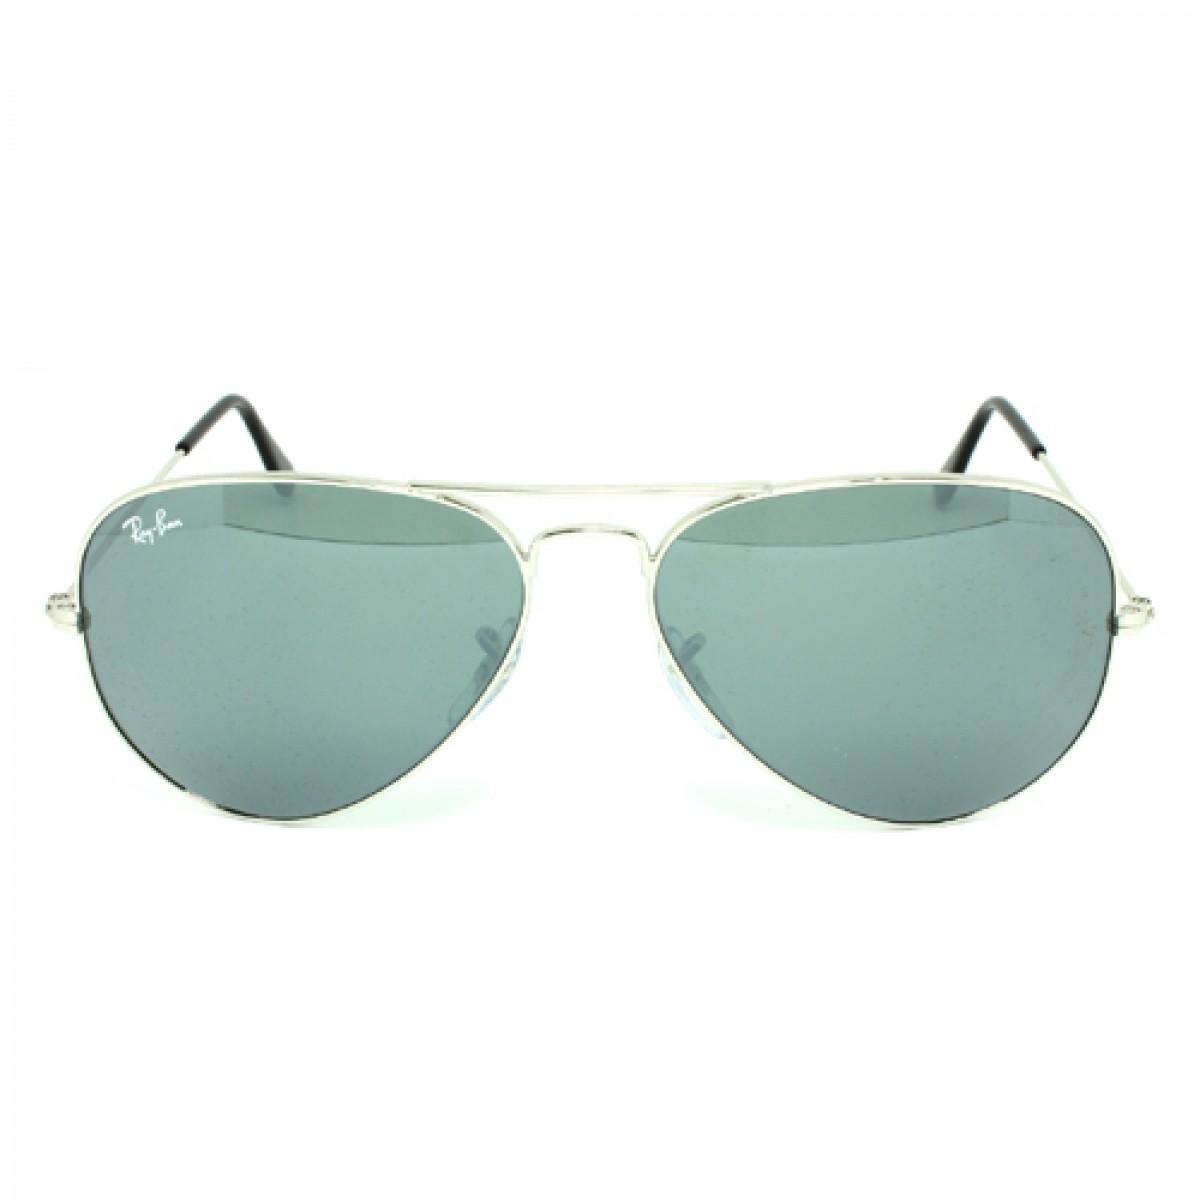 dd9370ceaa Ray Ban Original Aviator Unisex Sunglasses RB3025-W3275 - Sunglasses ...